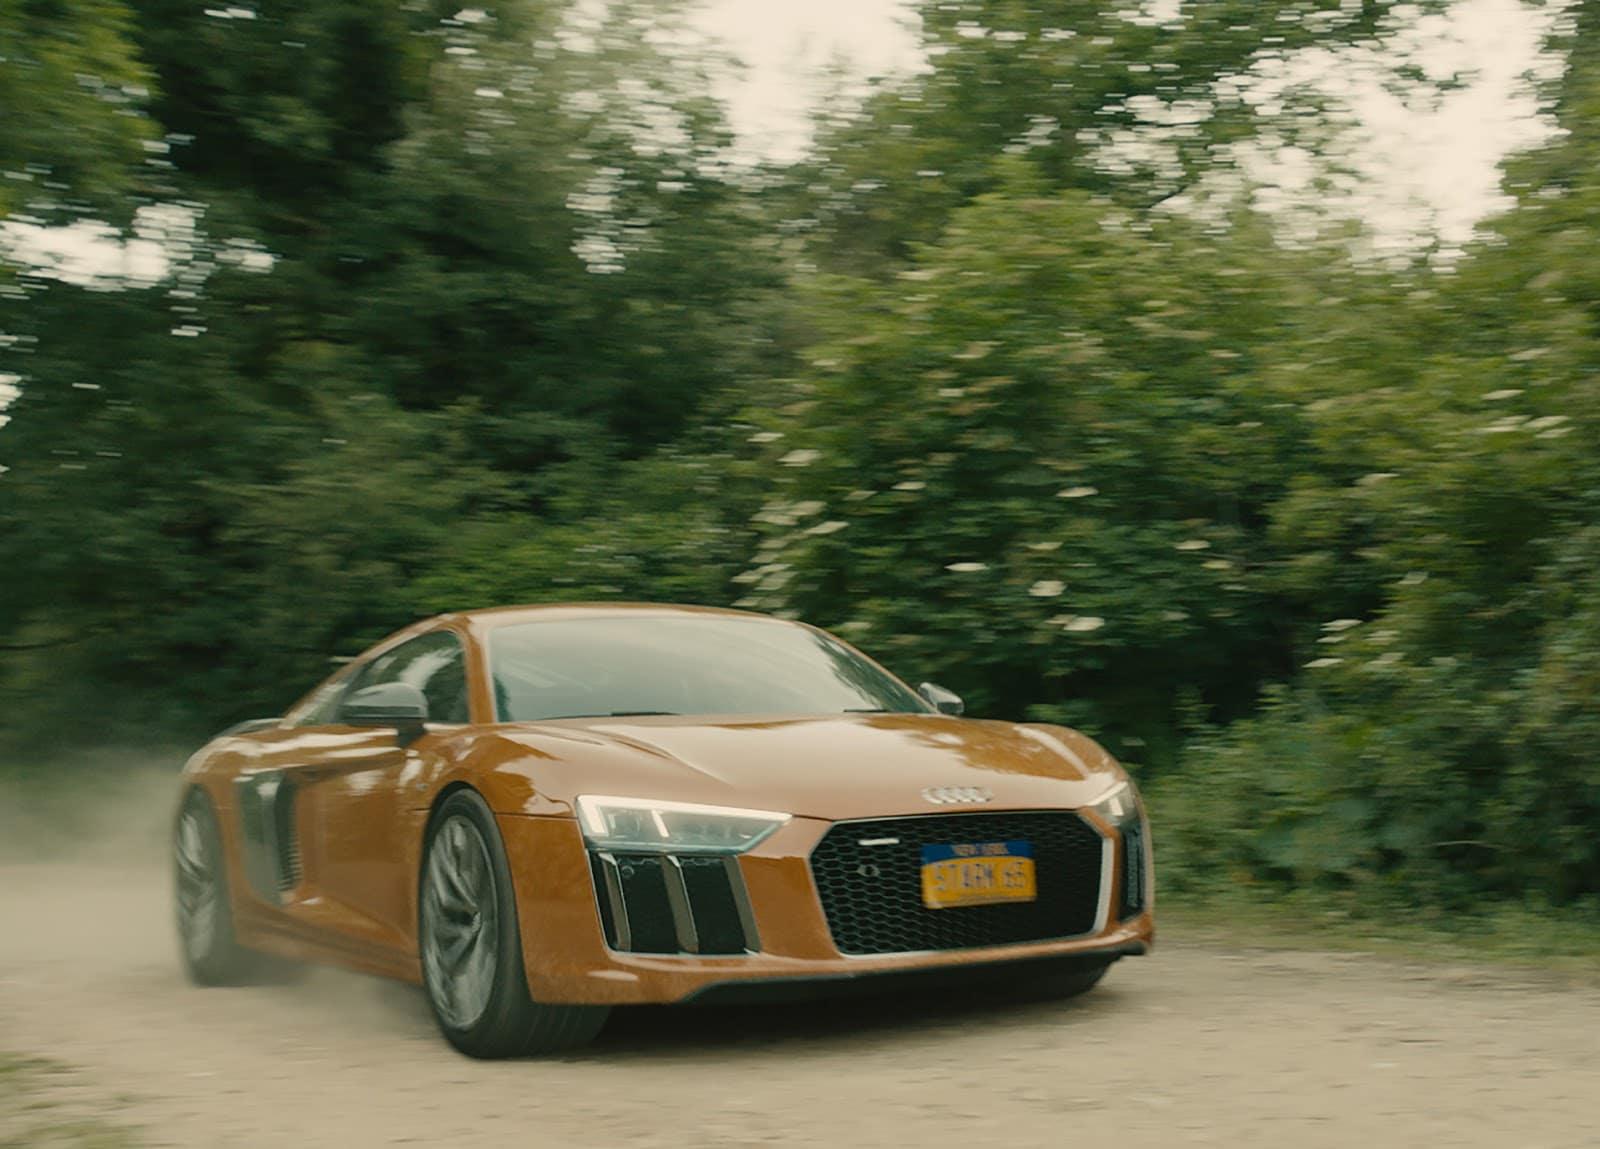 Tony Stark drives the new Audi R8 in Avengers Age of Ultron Απονέμουμε τα Όσκαρ αυτοκινήτου Fun, Jaguar C-X75, LYKAN HYPERSPORT, movie cars, videos, zblog